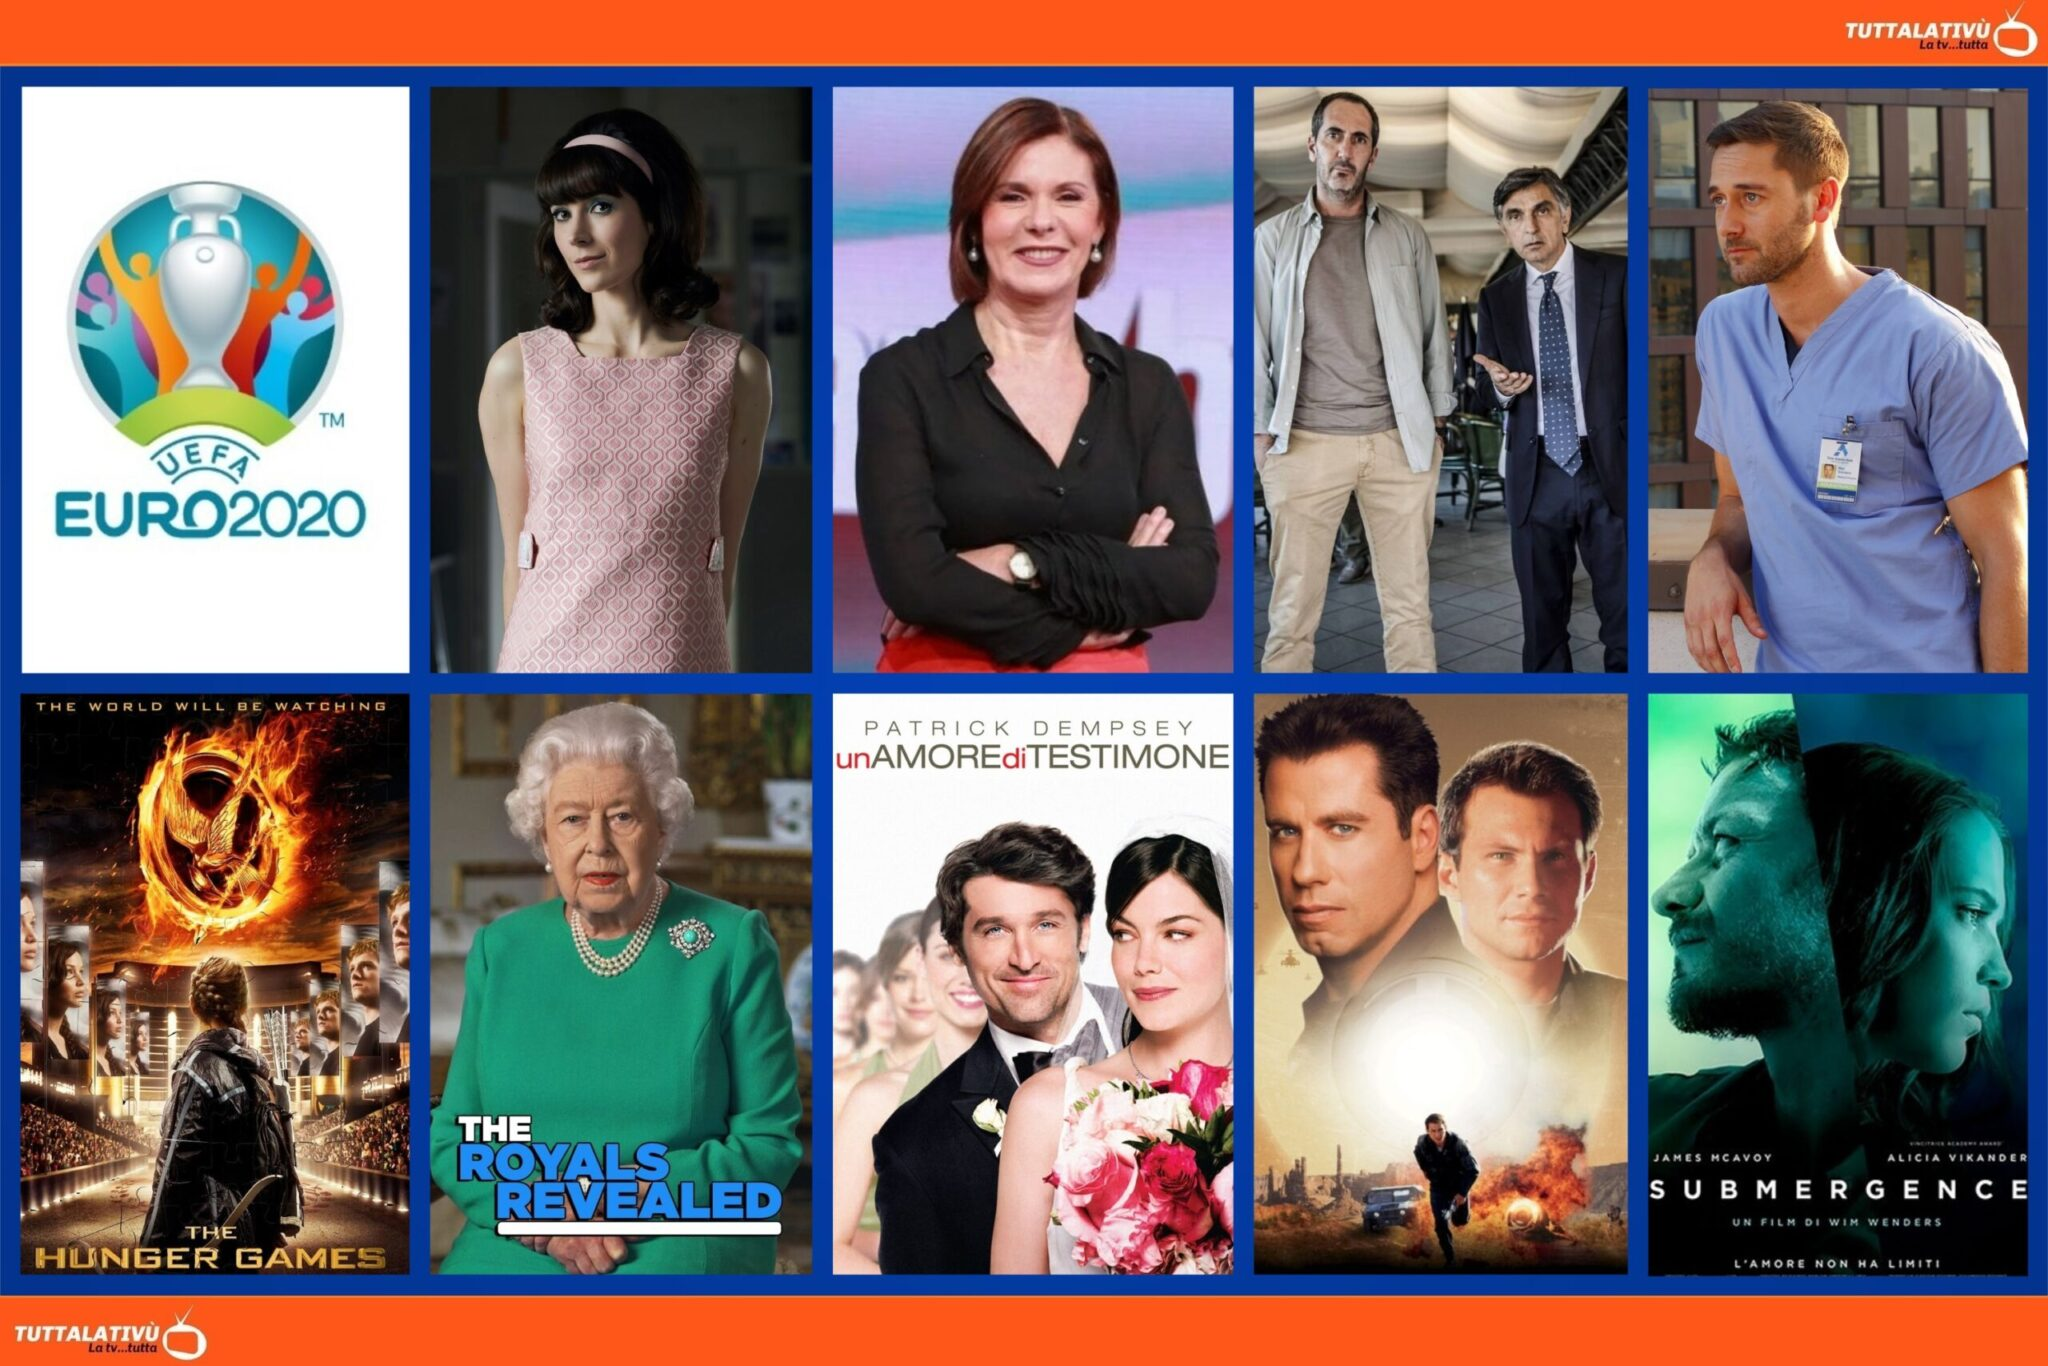 GuidaTV 22 Giugno 2021: Per Euro 2020, Repubblica Ceca-Inghilterra, New Amsterdam, Miss Fisher, #cartabianca, Hunger Games, Submergence